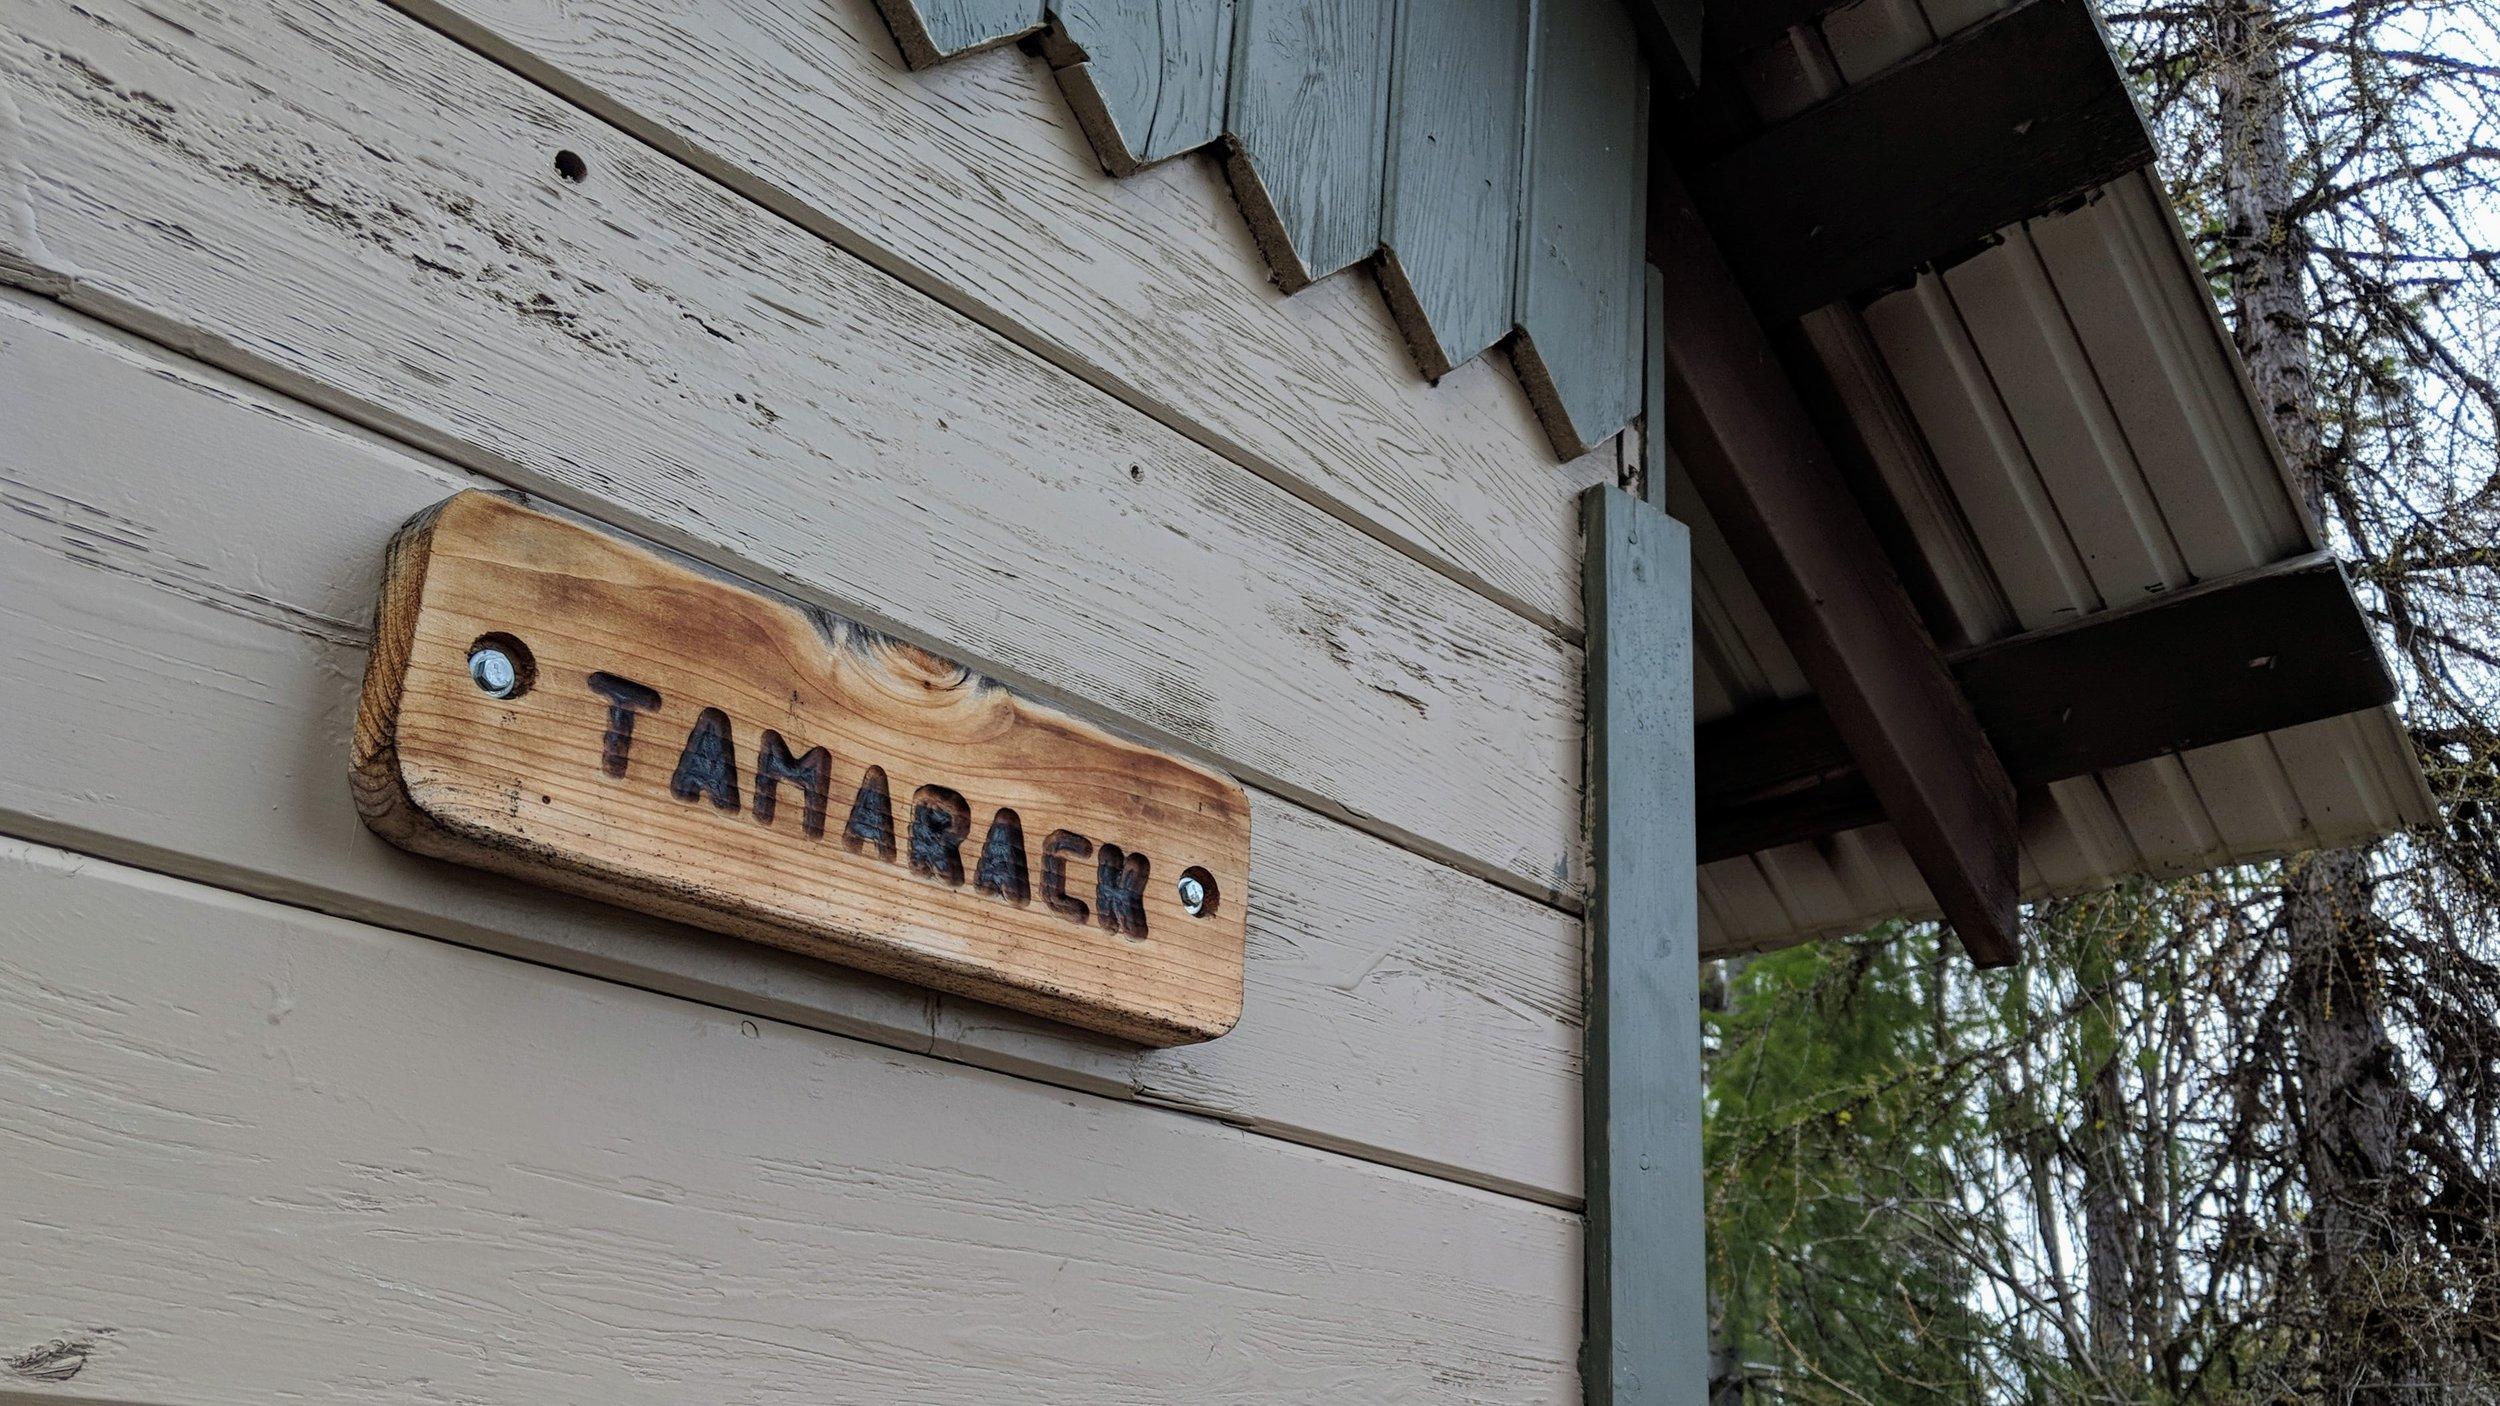 Tamarack cabin at Fields Spring State Park